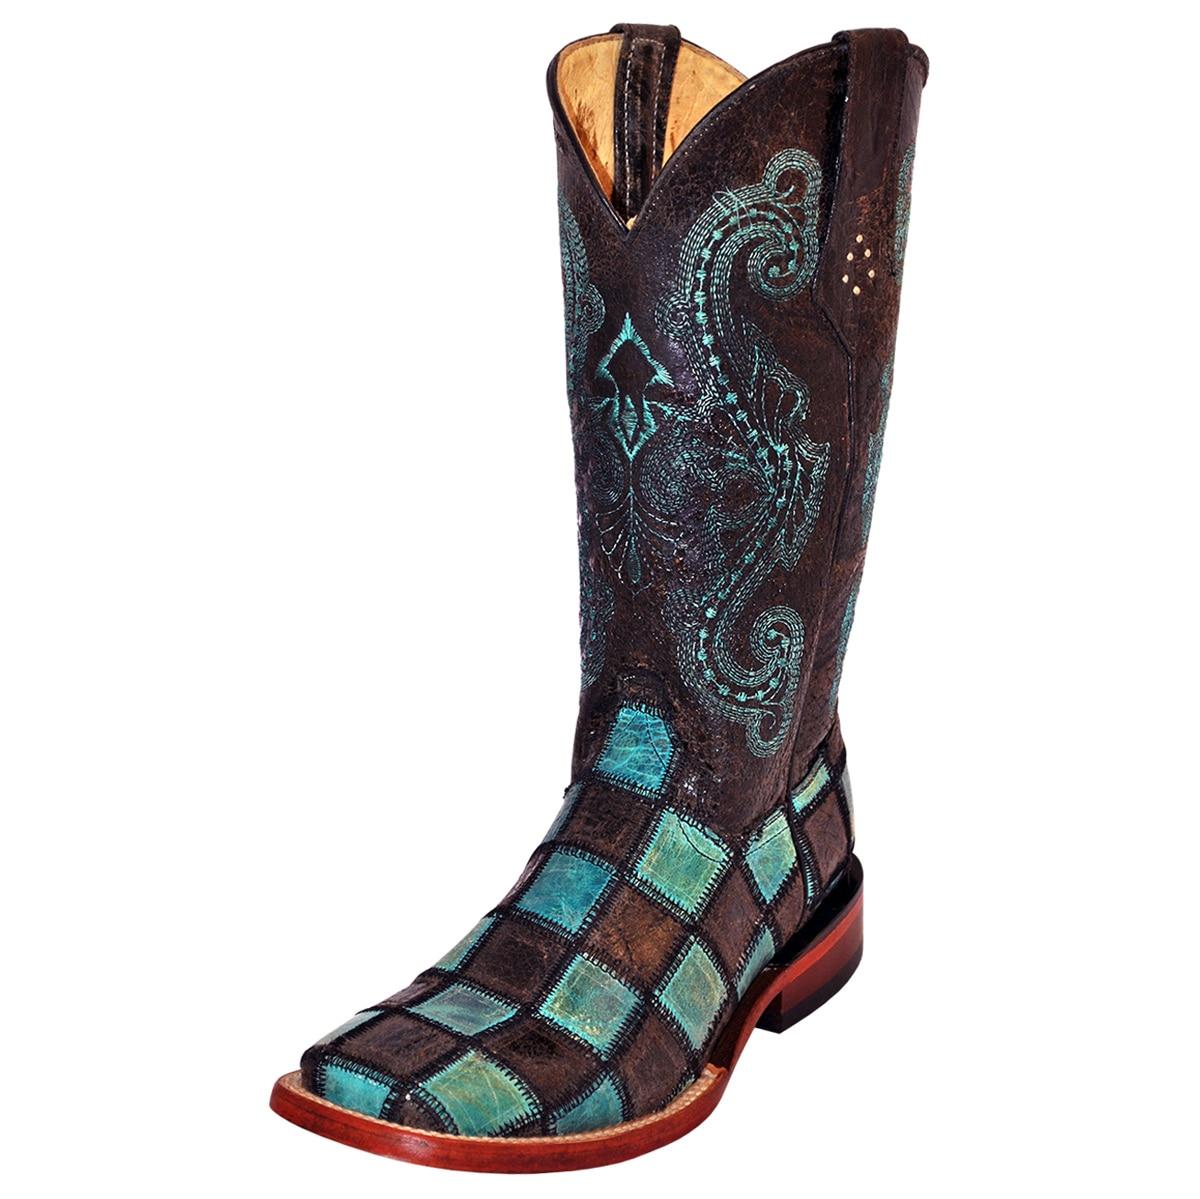 Ferrini Women's Patchwork Wide Square Toe Boots